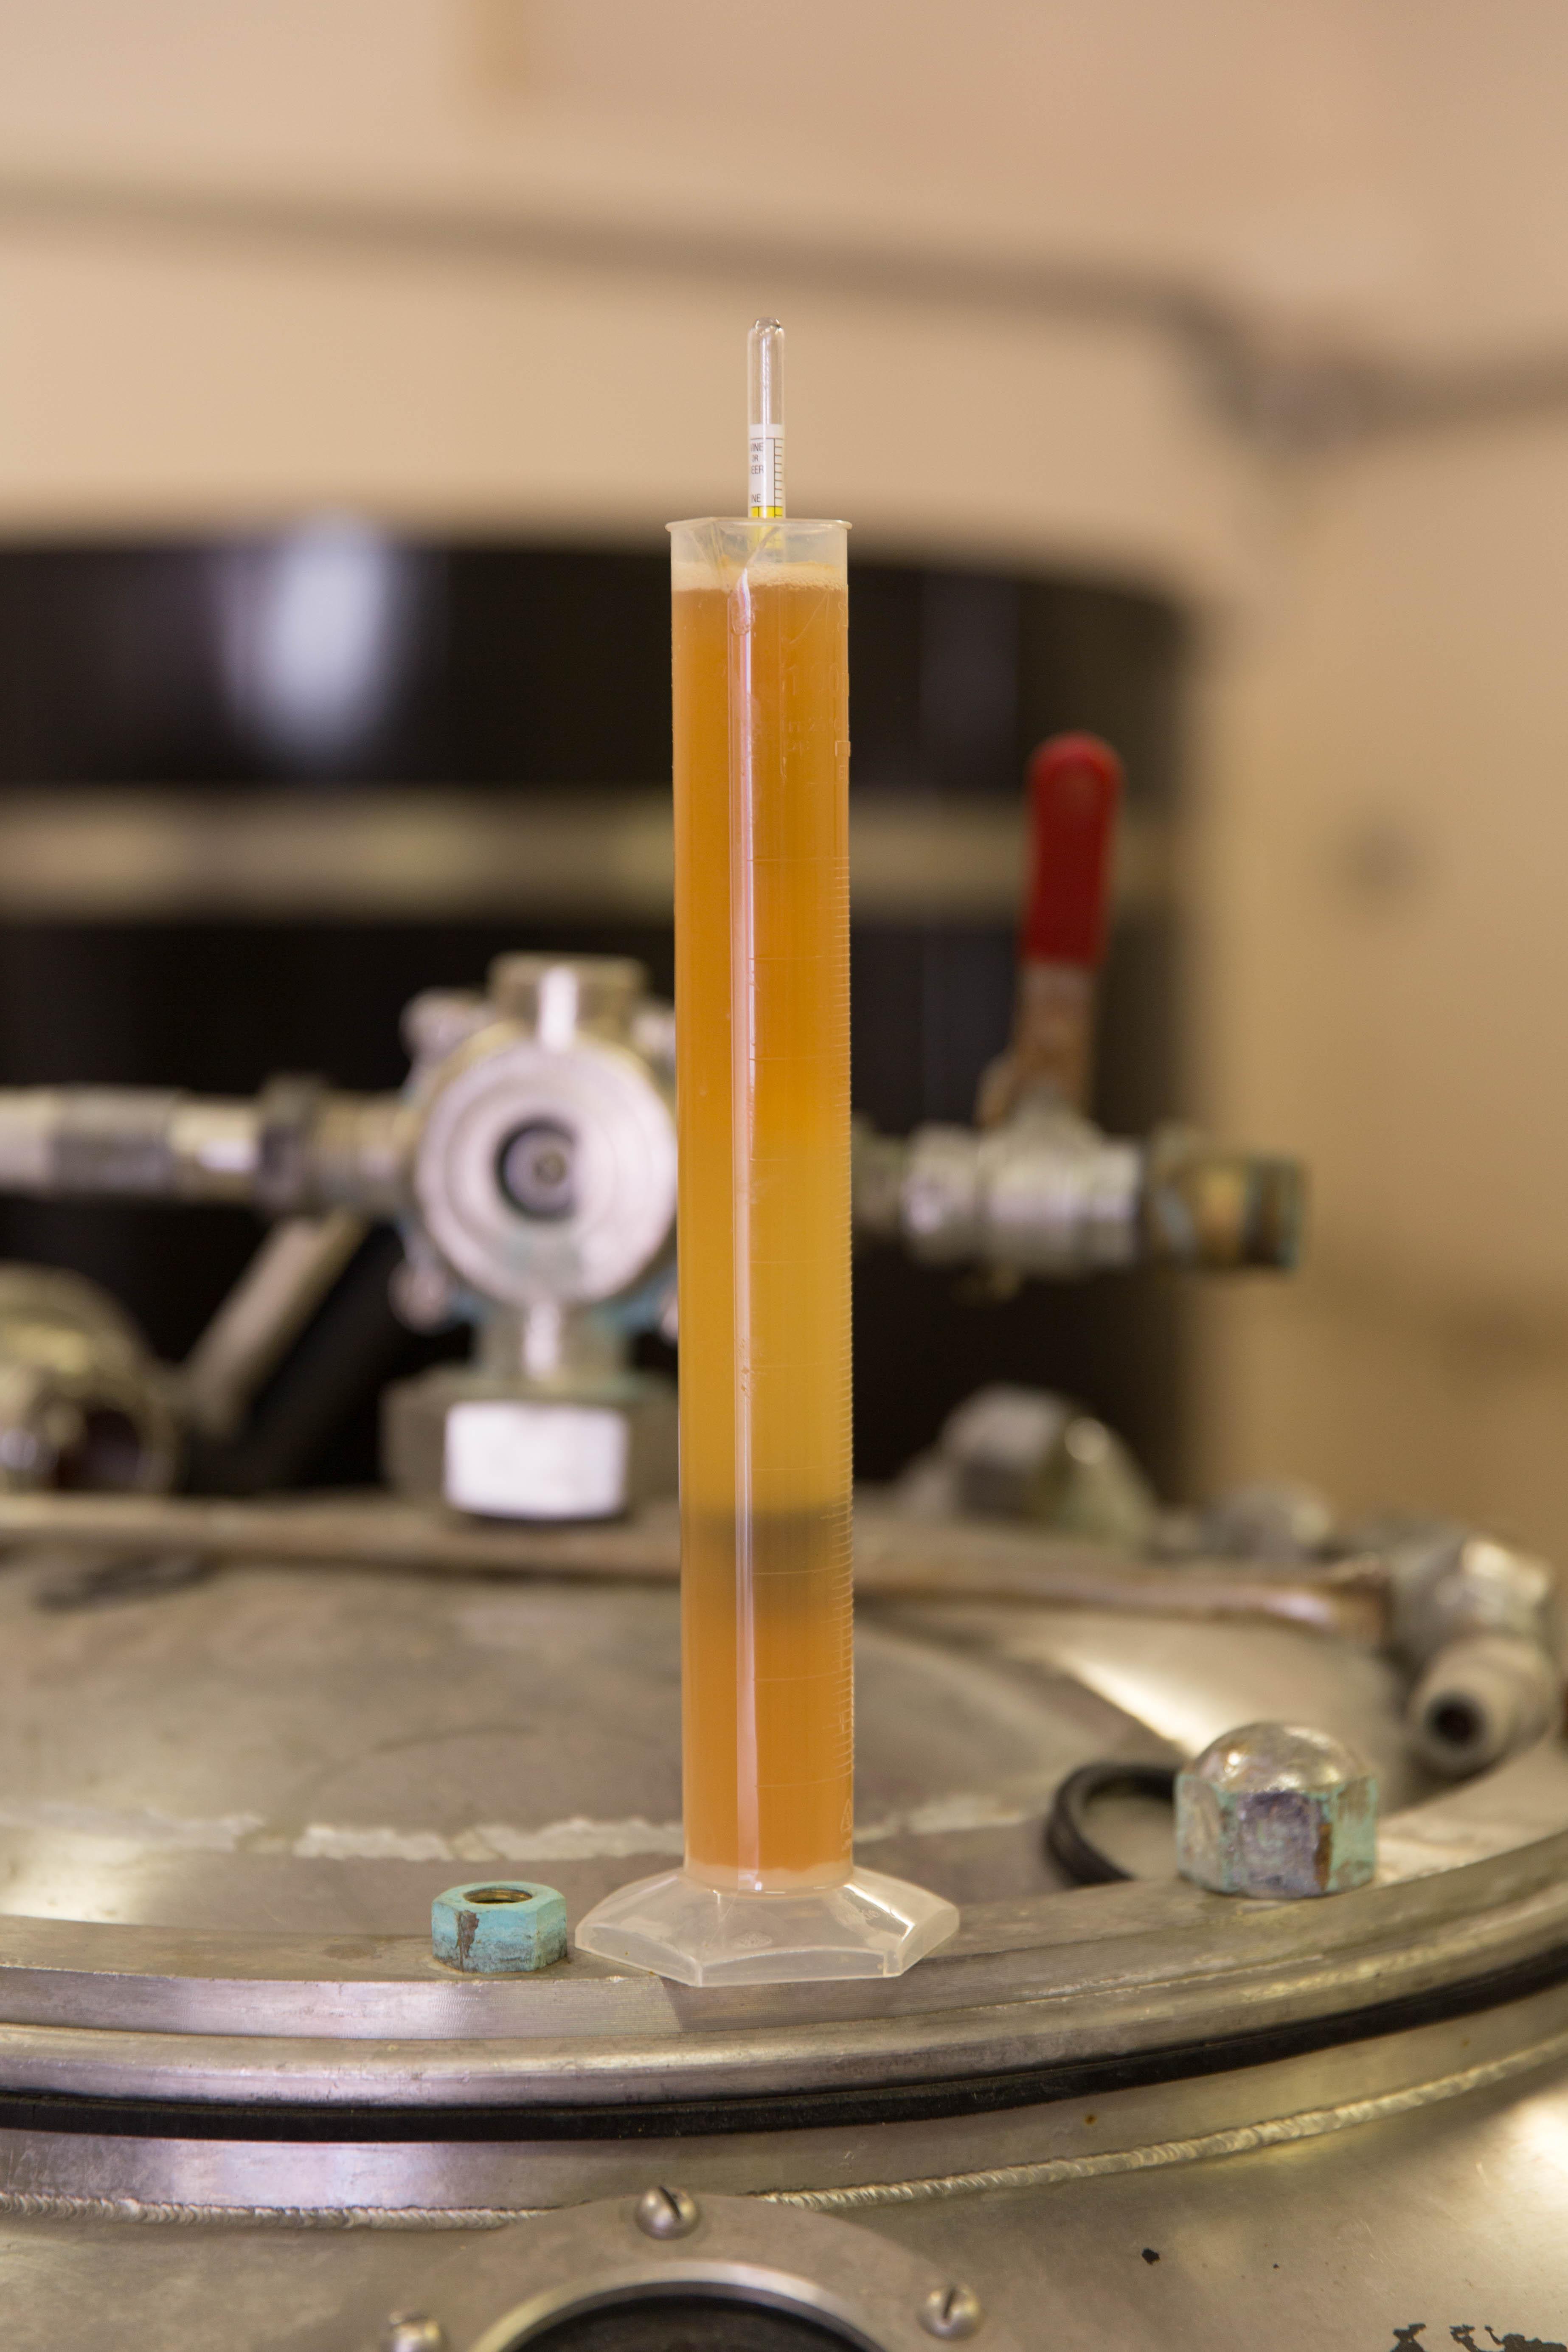 Test Tube Beer